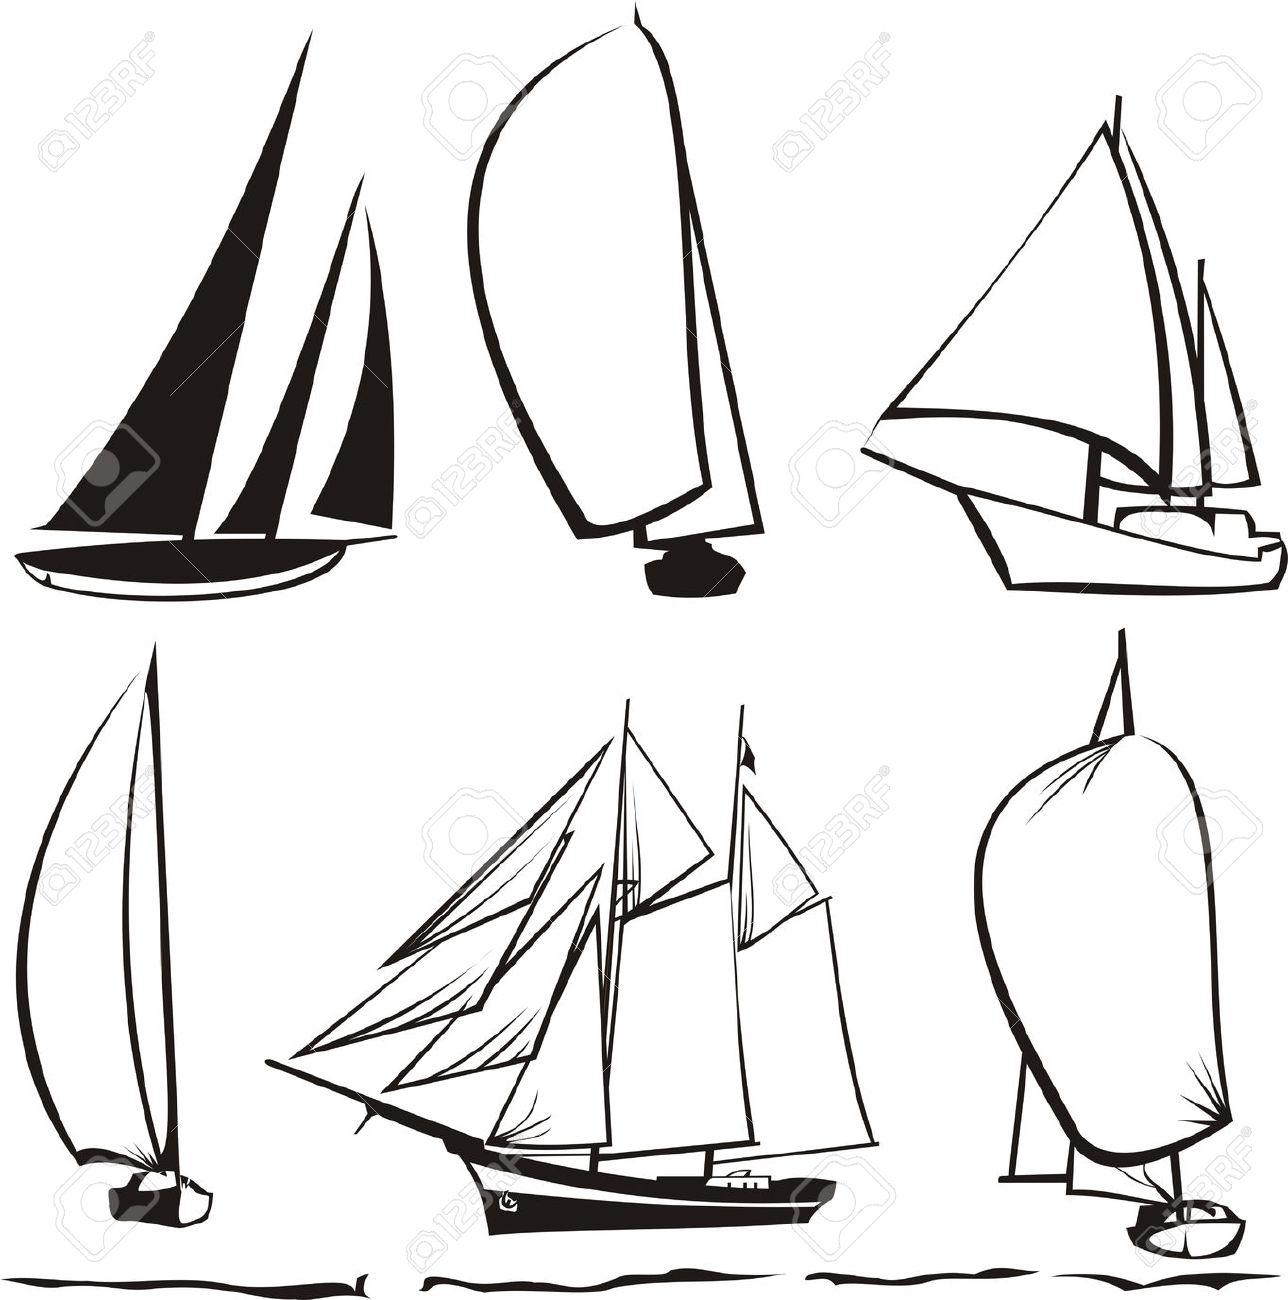 1288x1300 Drawn Sailing Silhouette